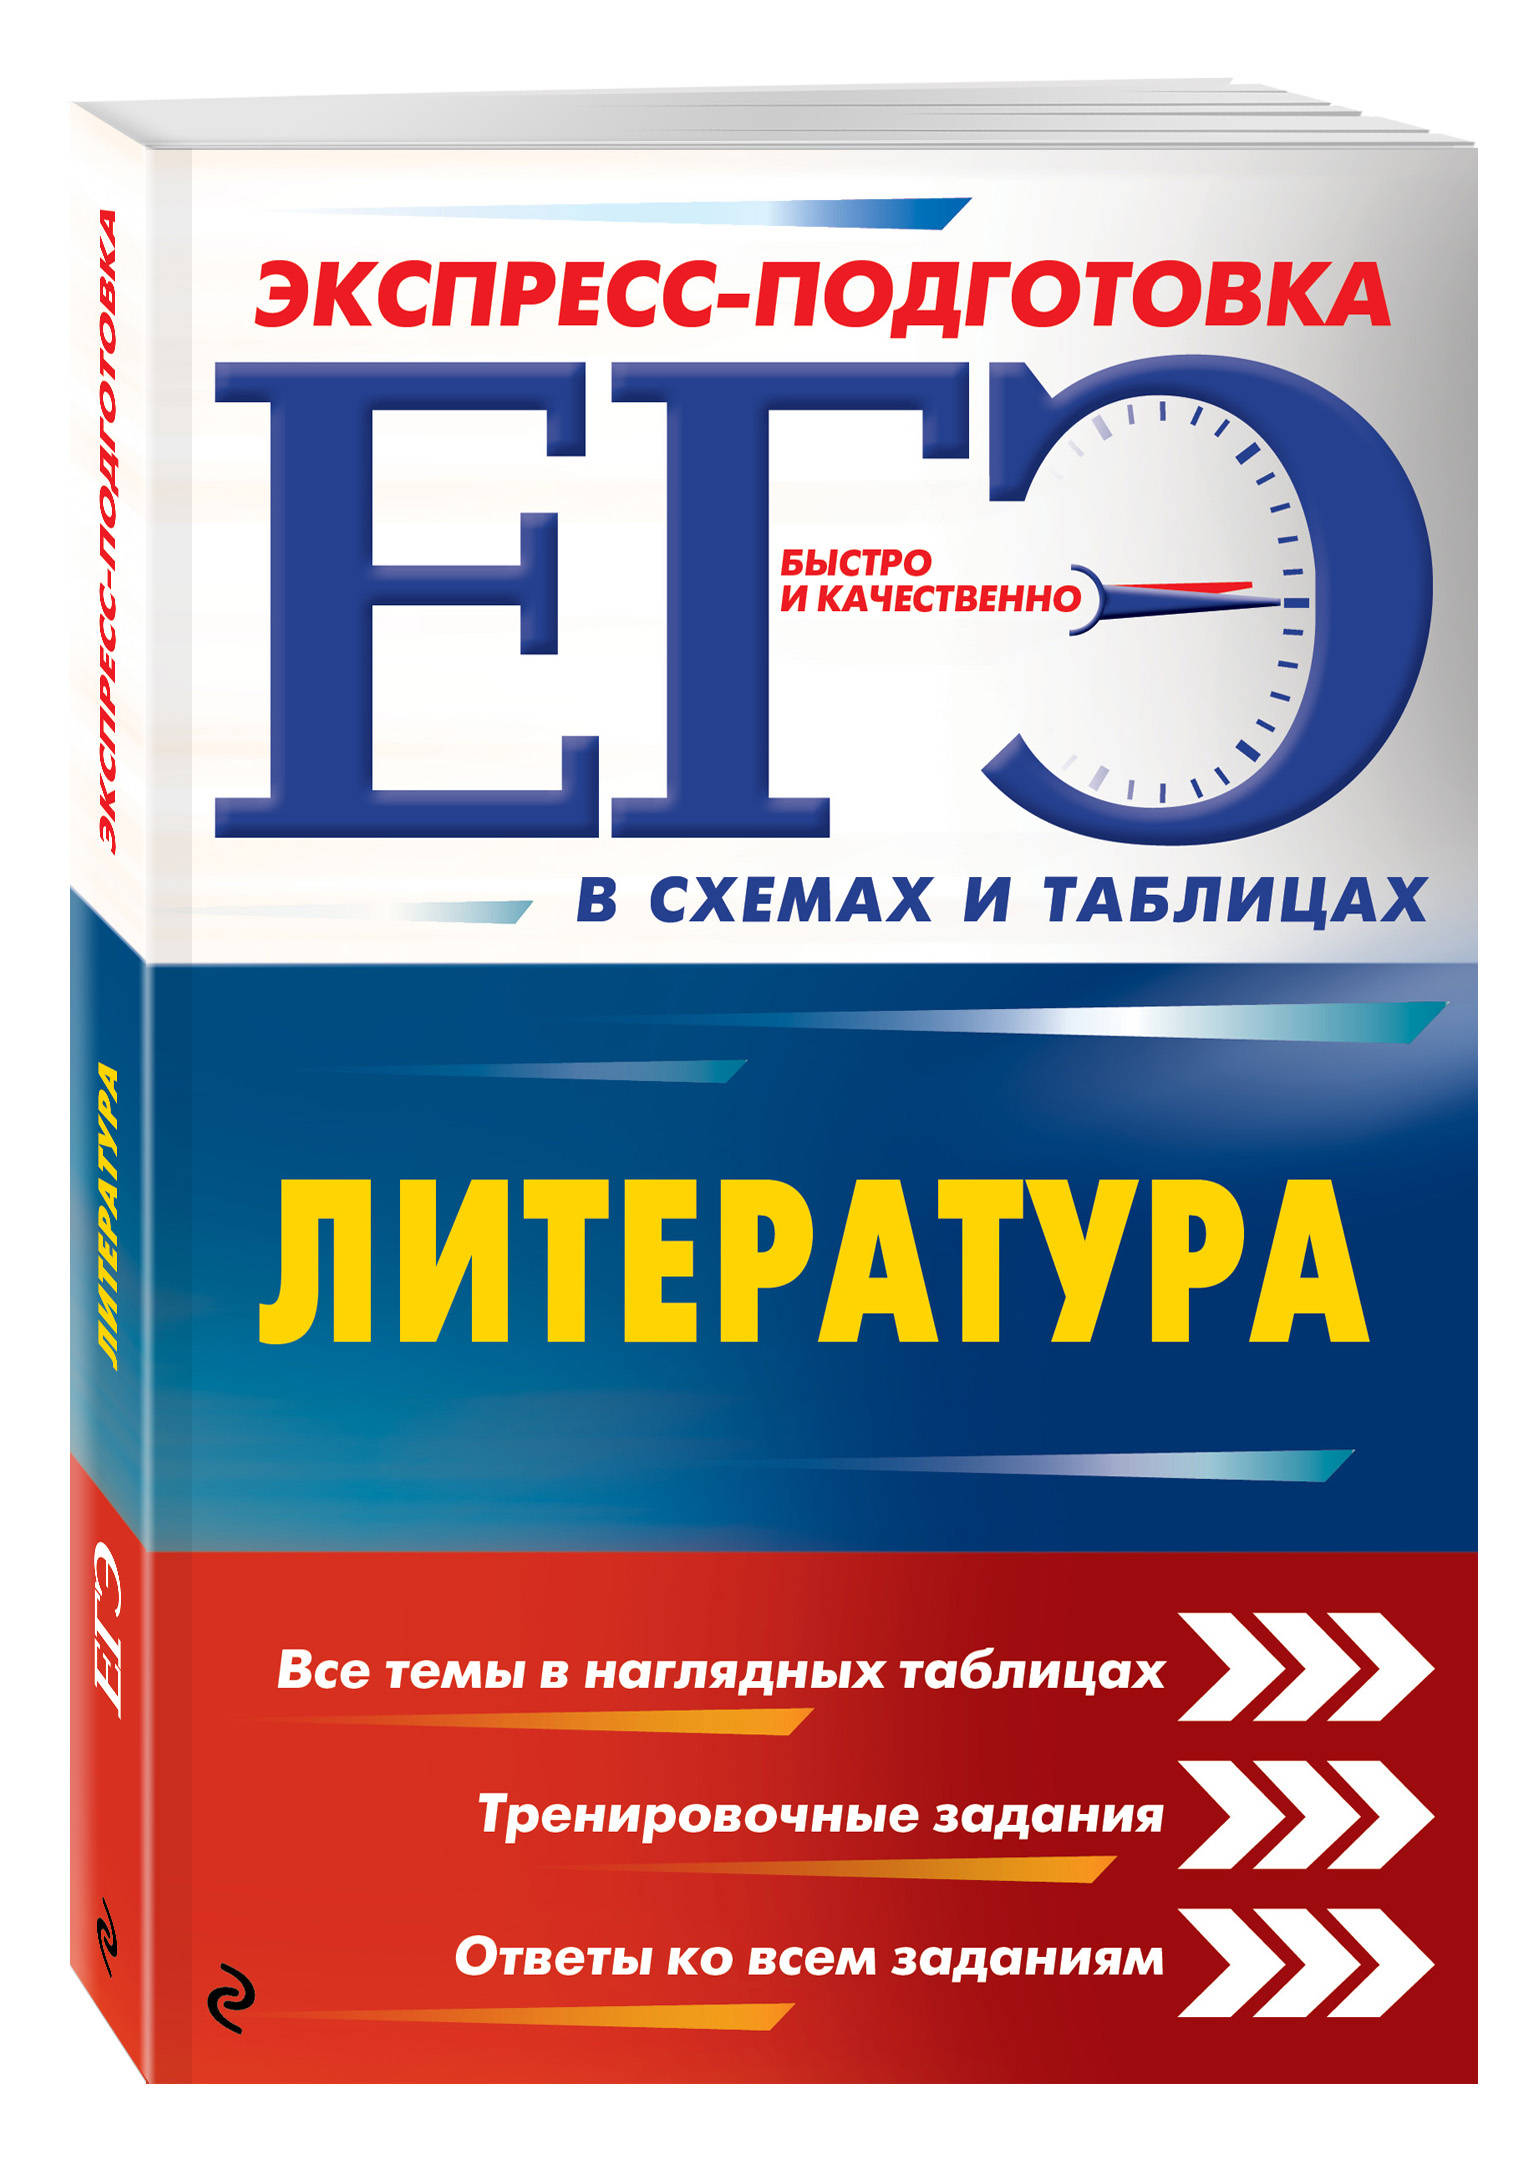 Е. А. Титаренко, Е. Ф. Хадыко, А. Г. Жемерова ЕГЭ. Литература